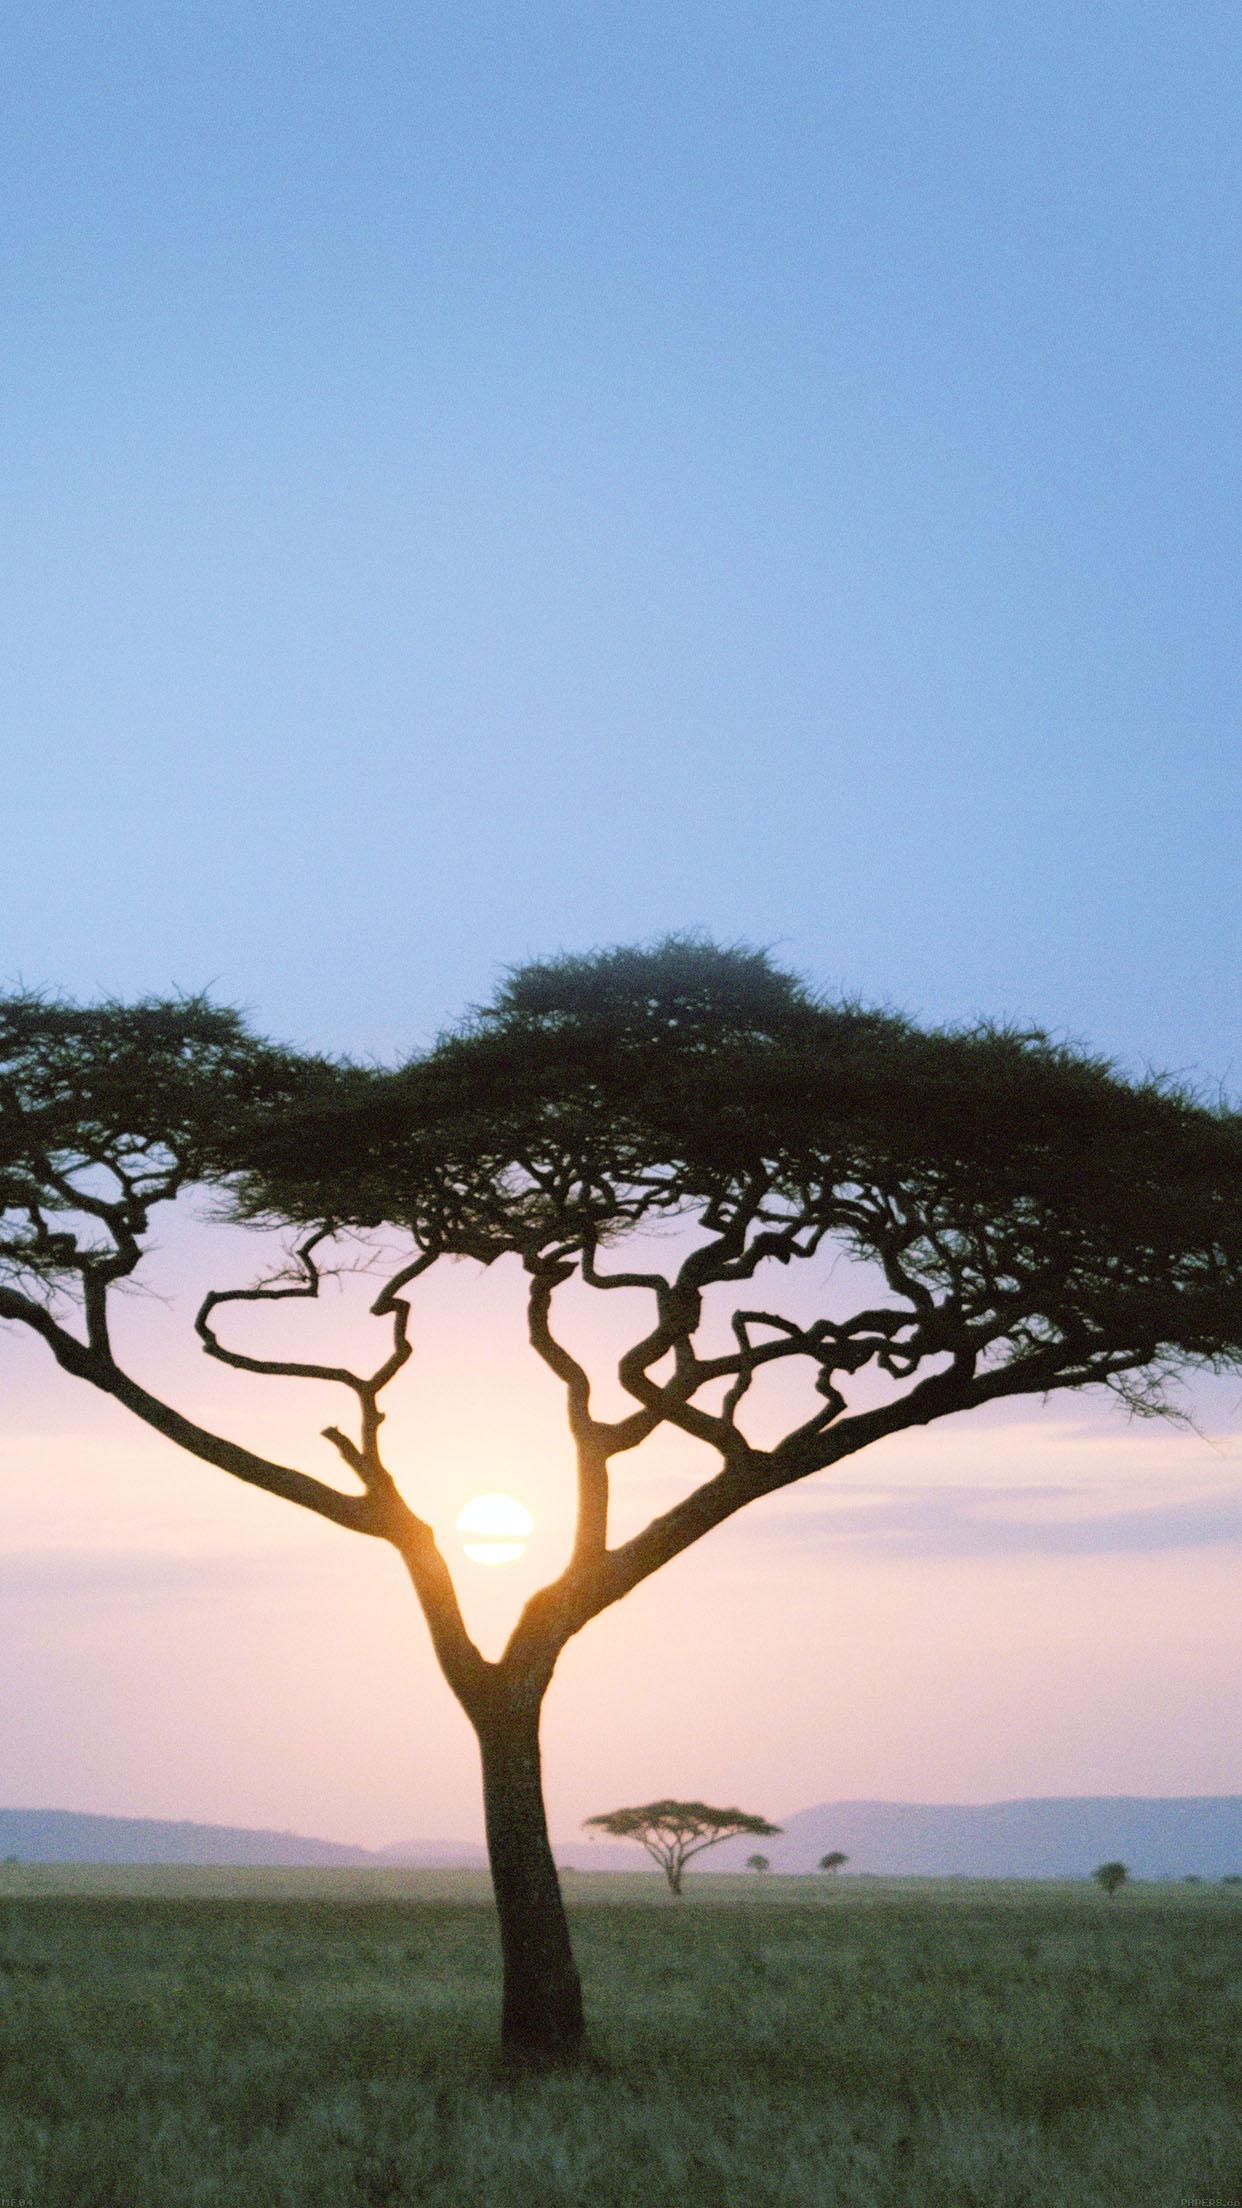 mf04-solo-tree-safari-day-africa-sunrise - Papers.co